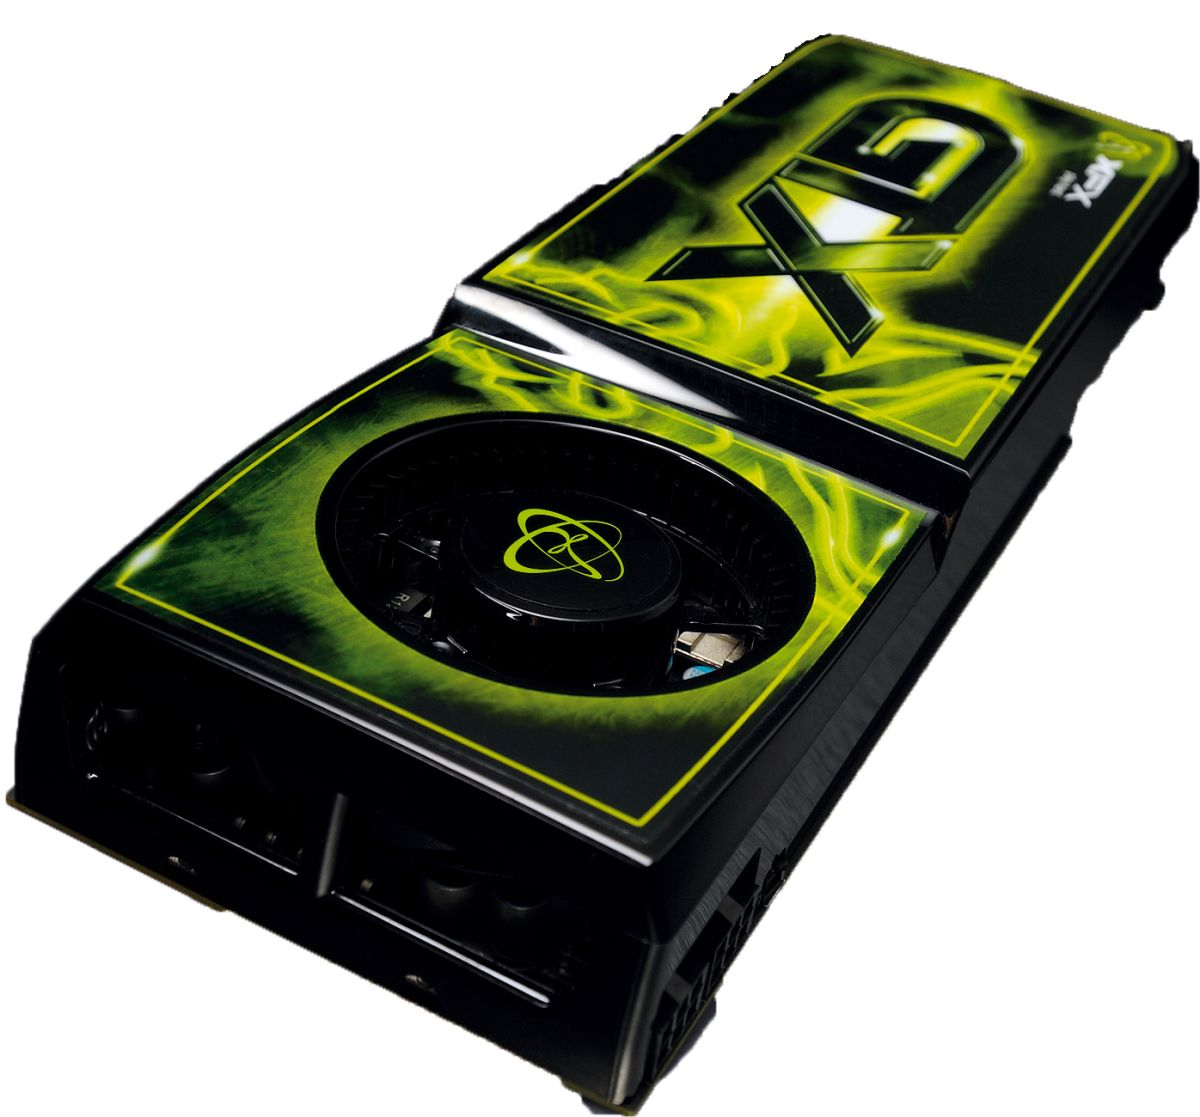 XFX GeForce GTX 275XXX review | TechRadar